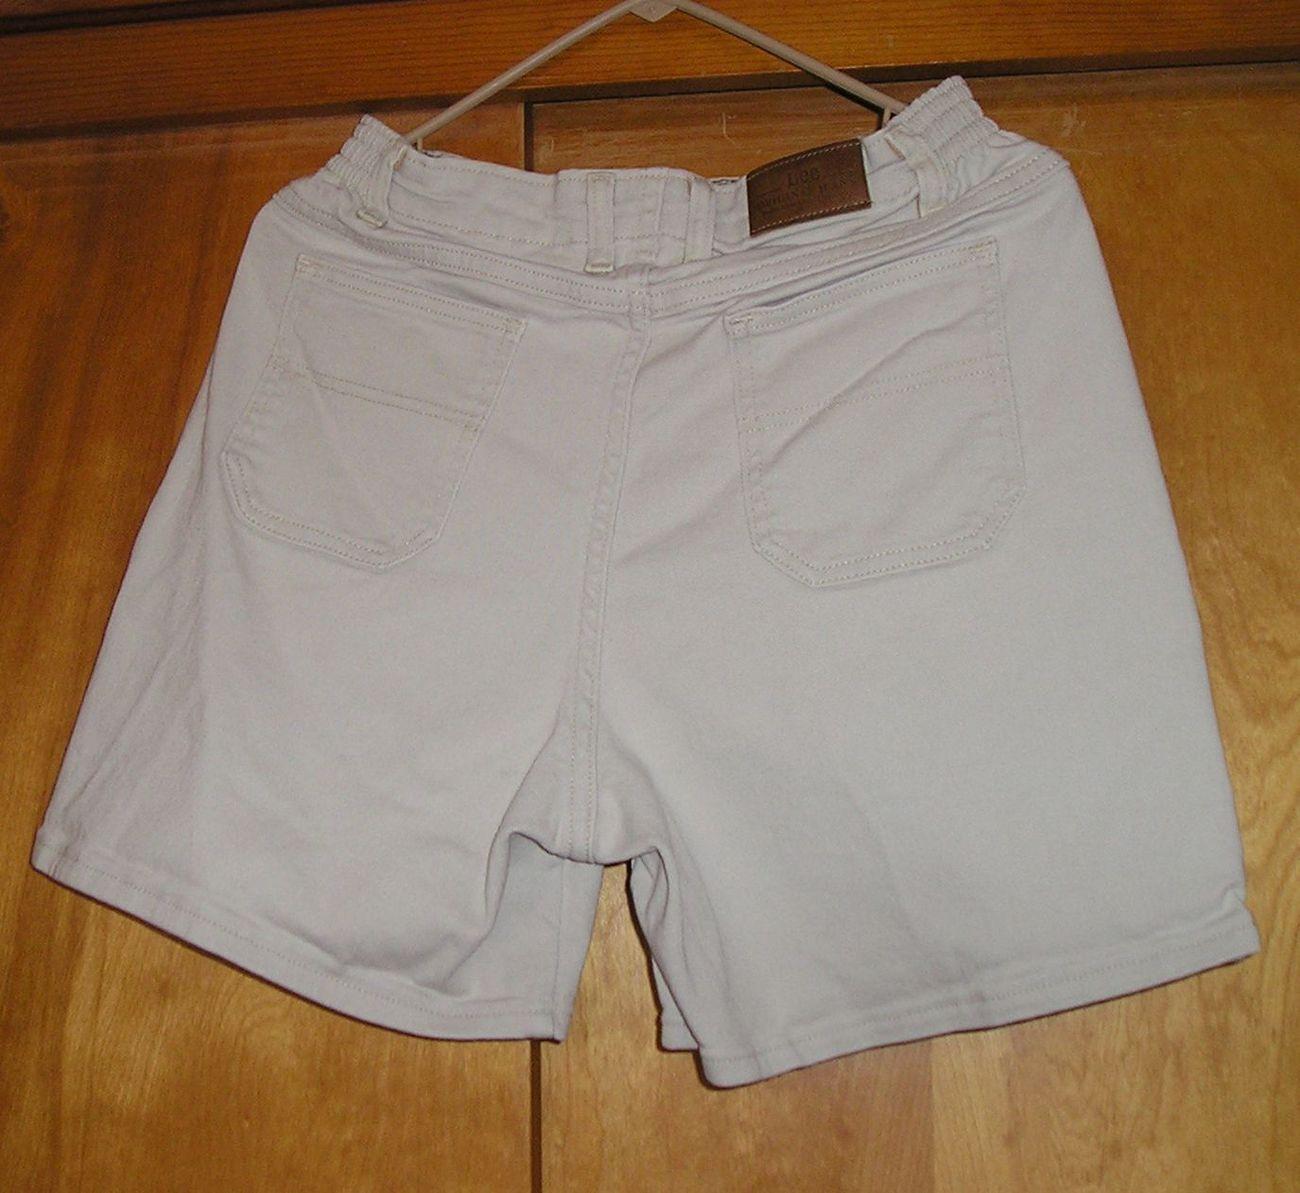 LEE Original Jeans Women's Bone Shorts Size 8 M Medium NICE